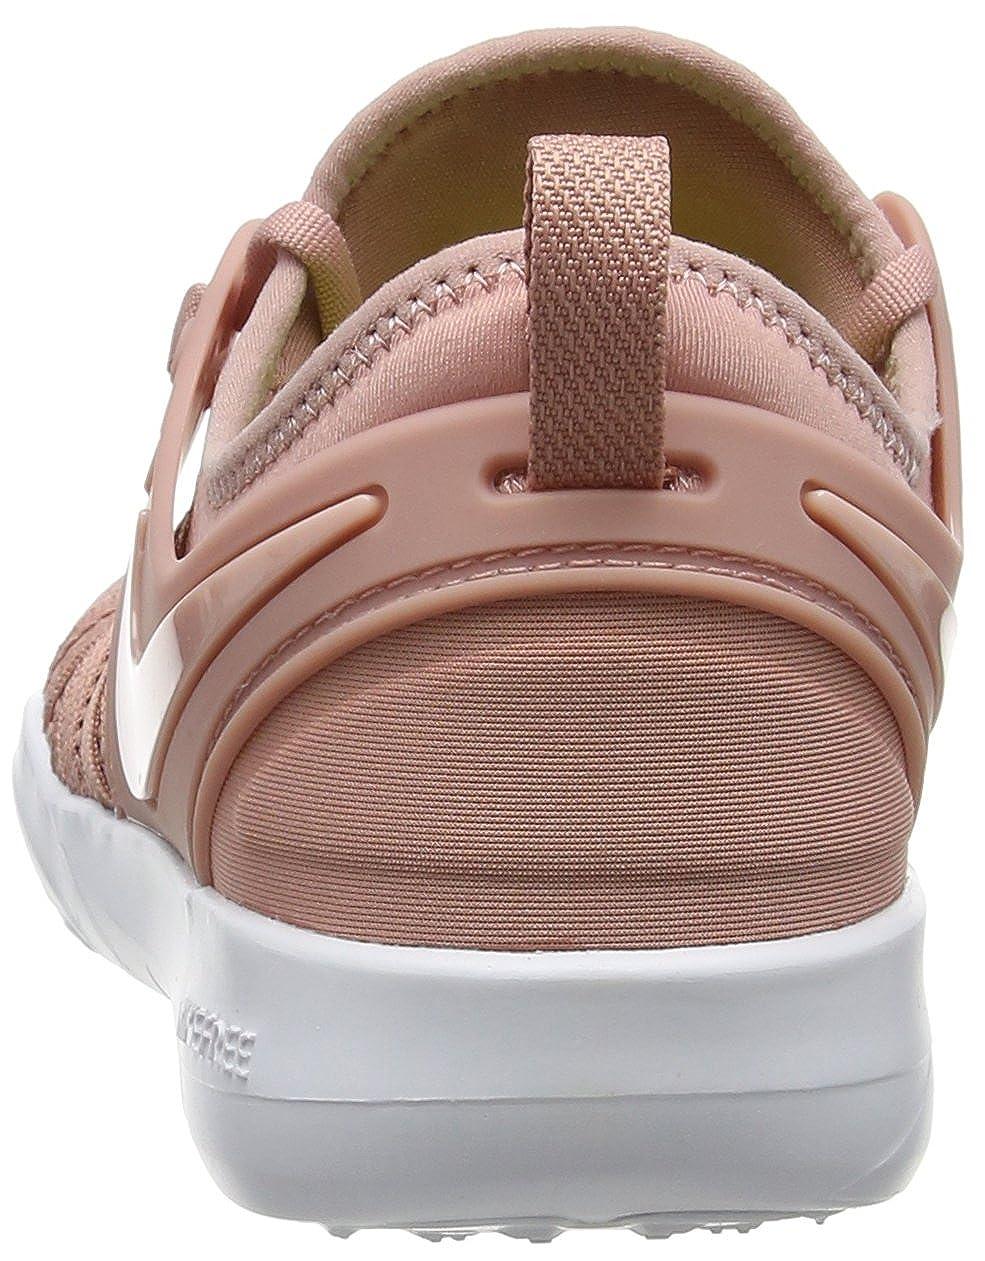 Nike Damen WMNS Free Tr 7 7 7 Turnschuhe 4b708c